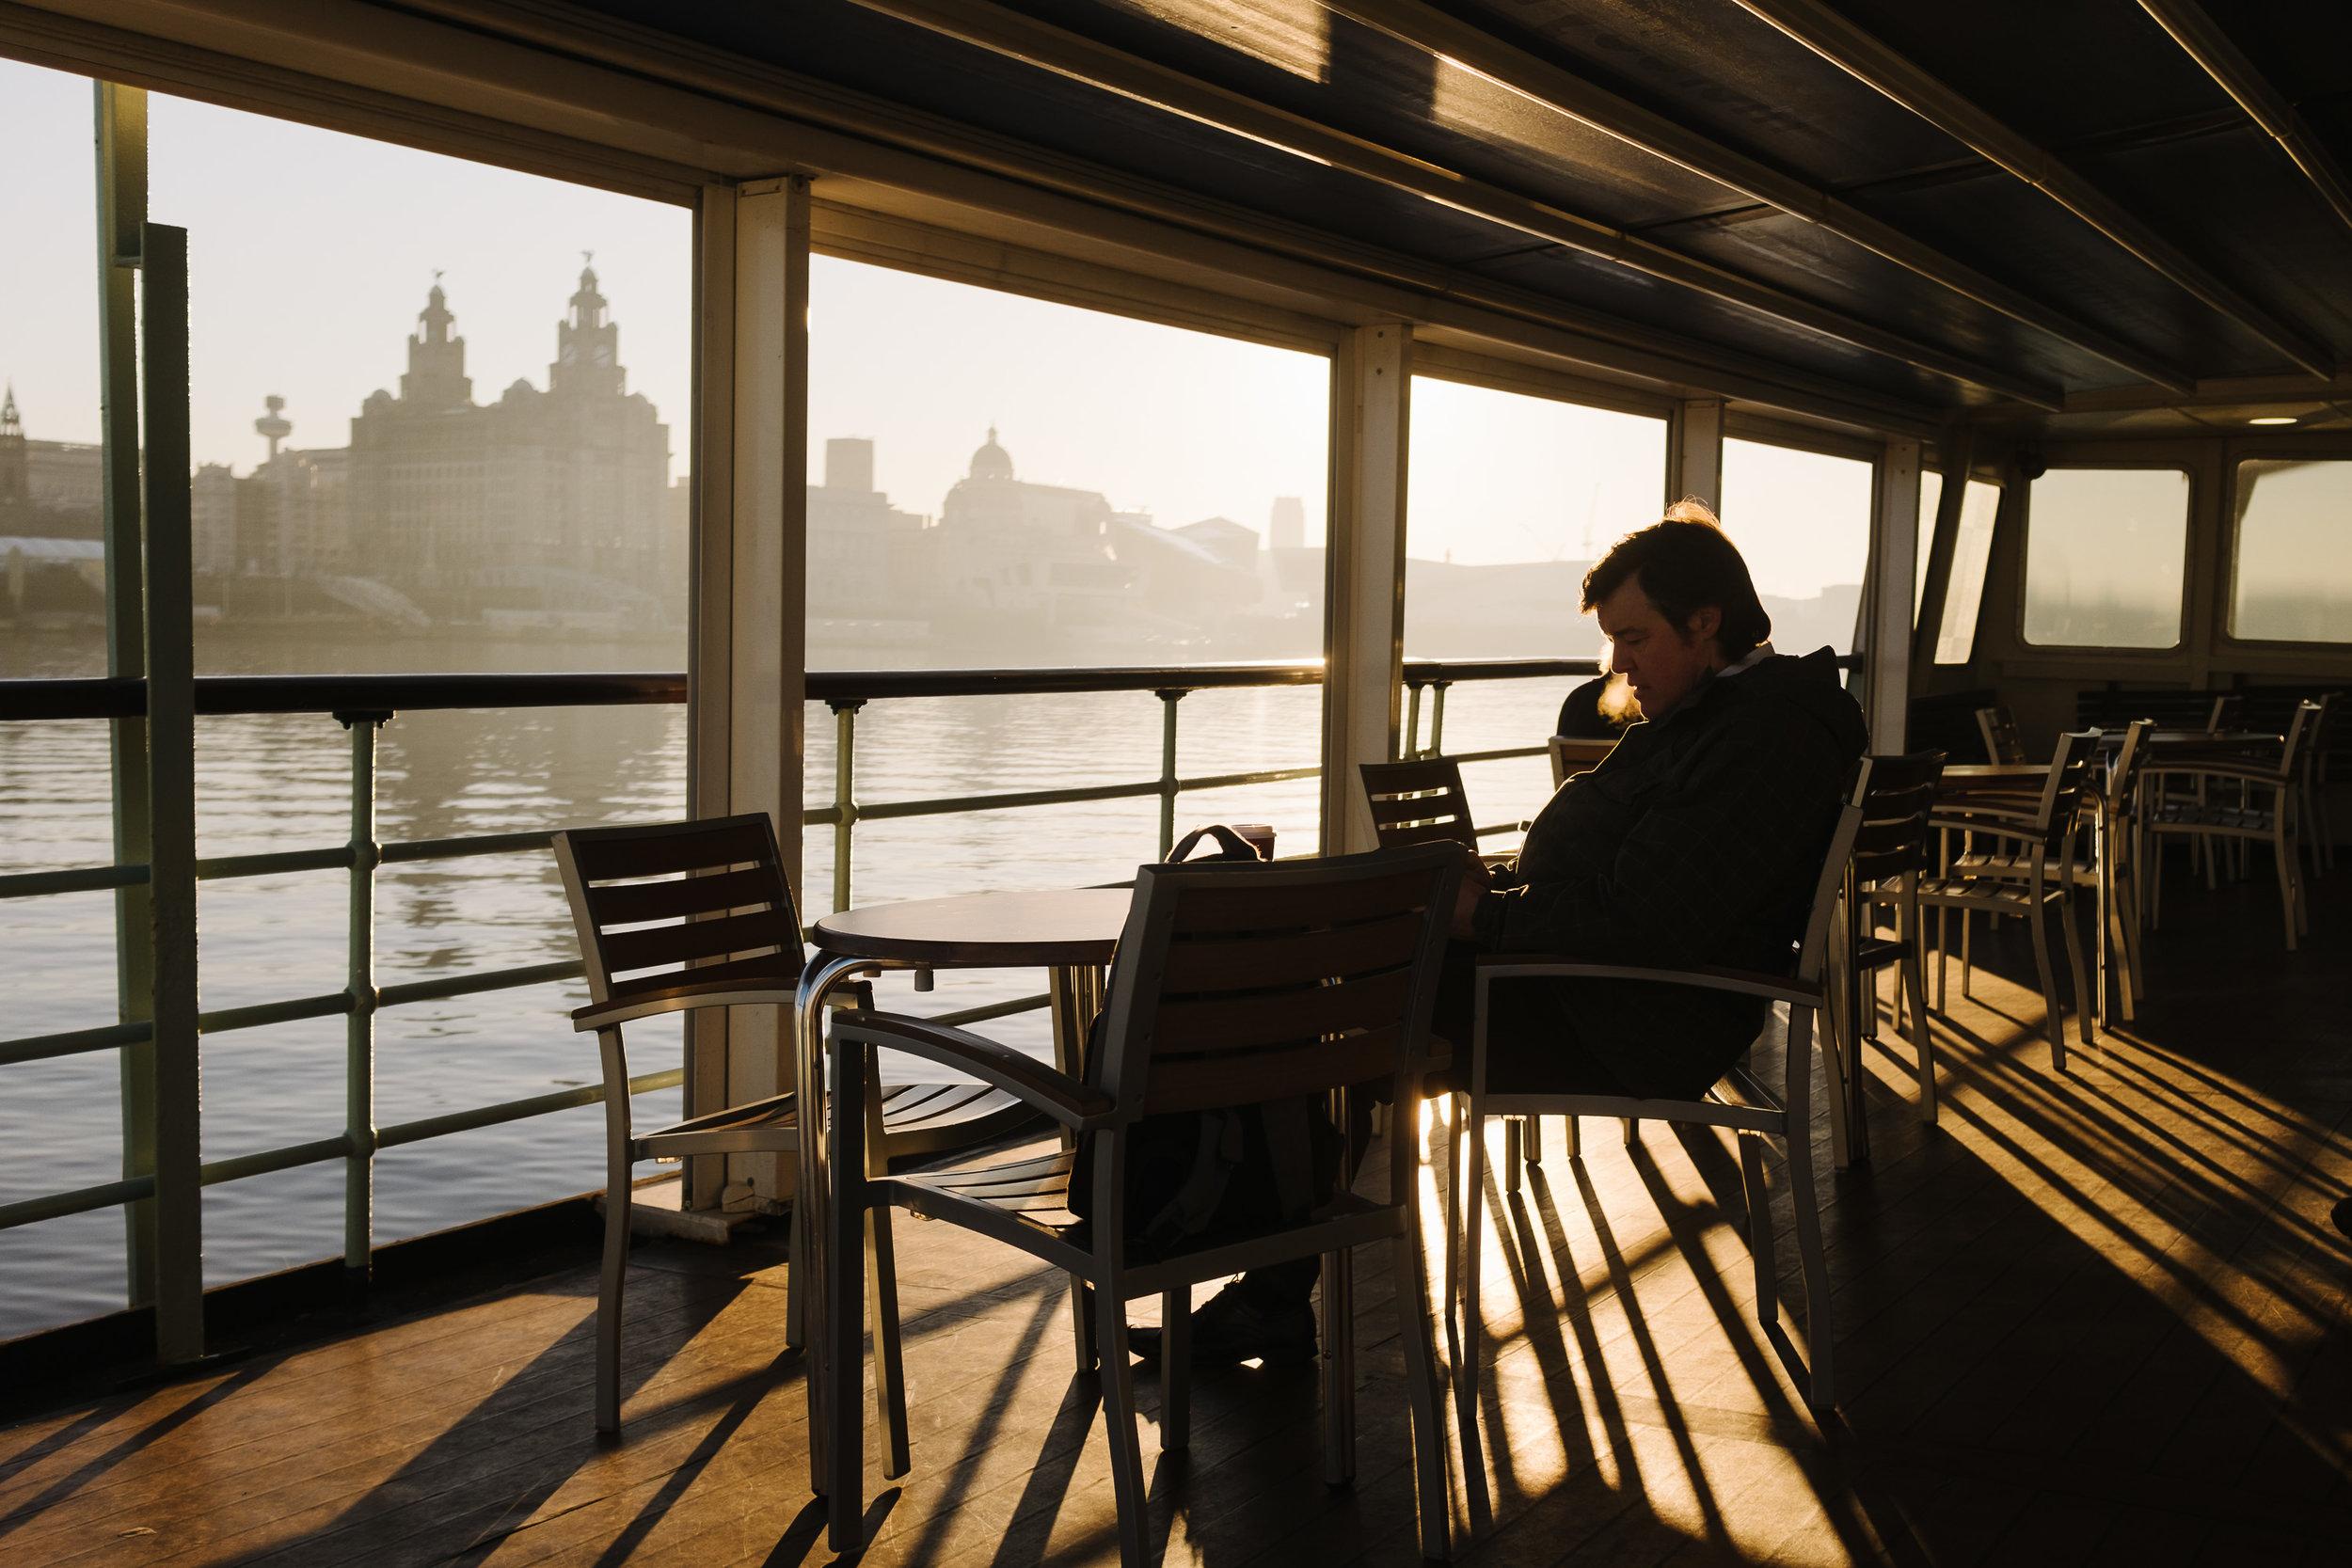 Ferry-1712-pete-carr.jpg